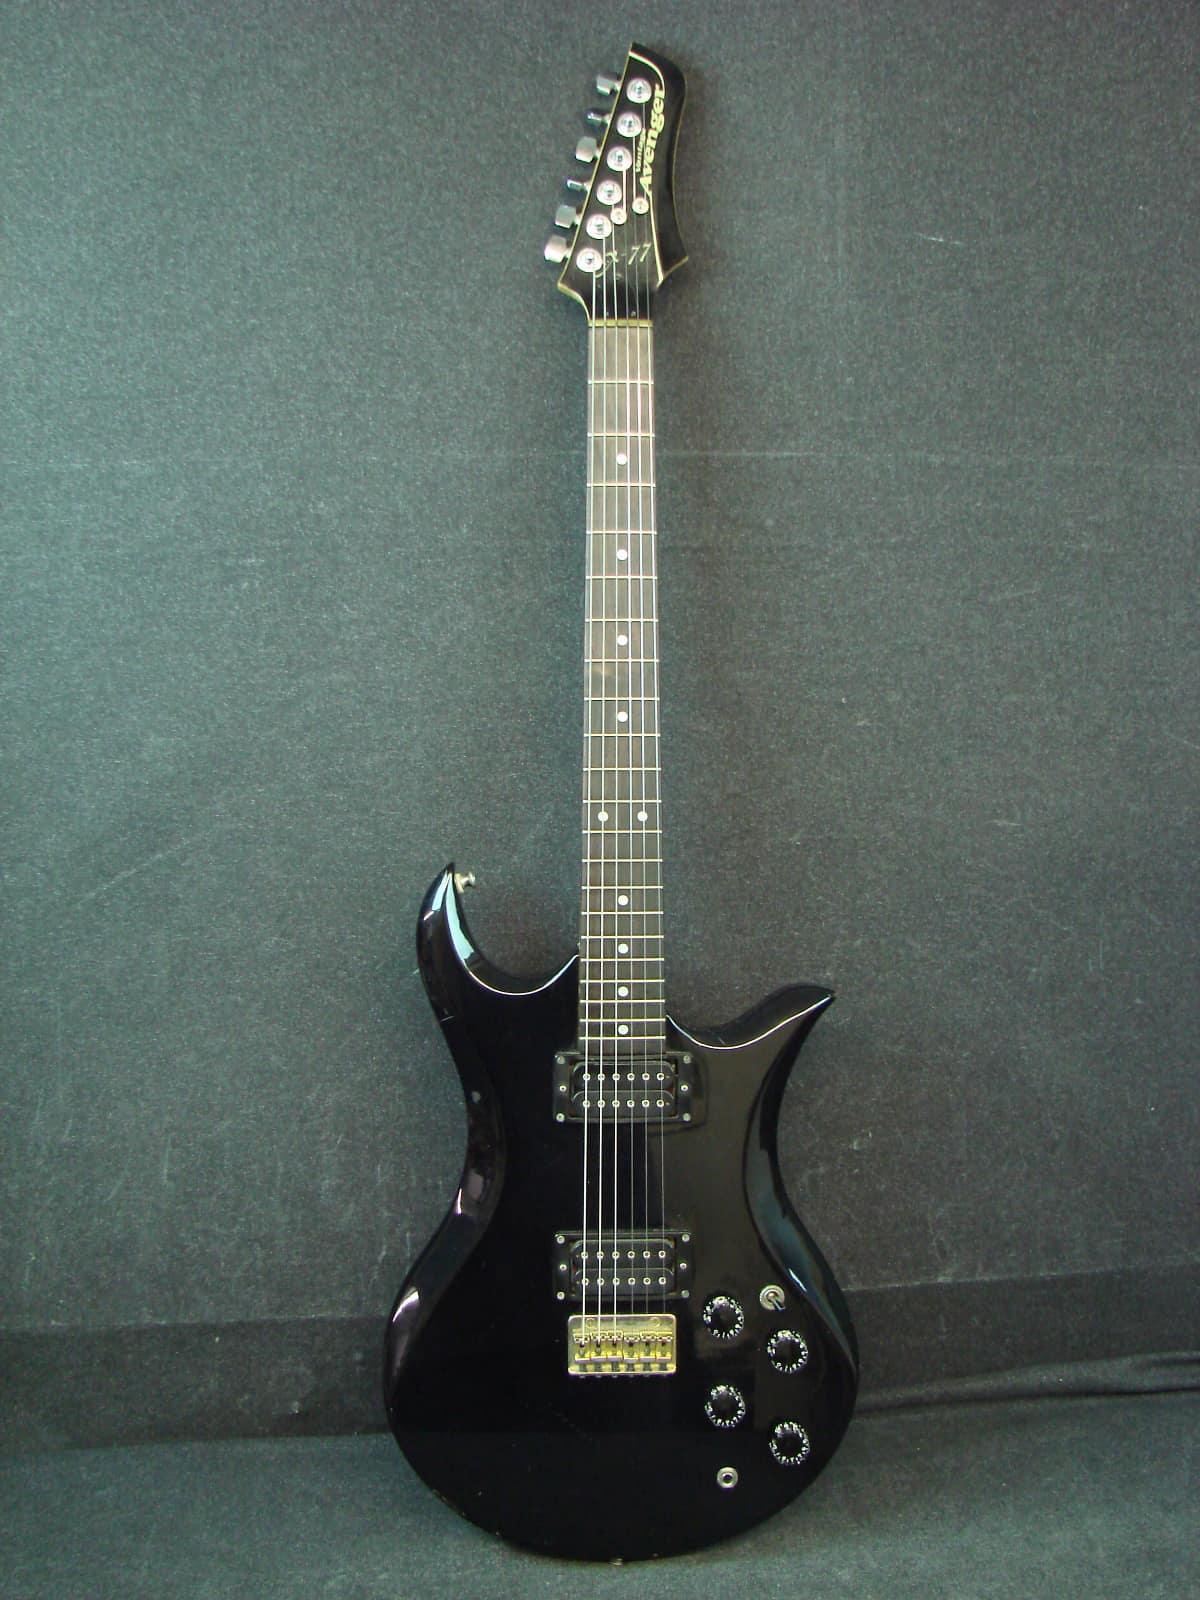 Vantage Avenger X 77 Black Electric Guitar Made In Japan X77 Reverb